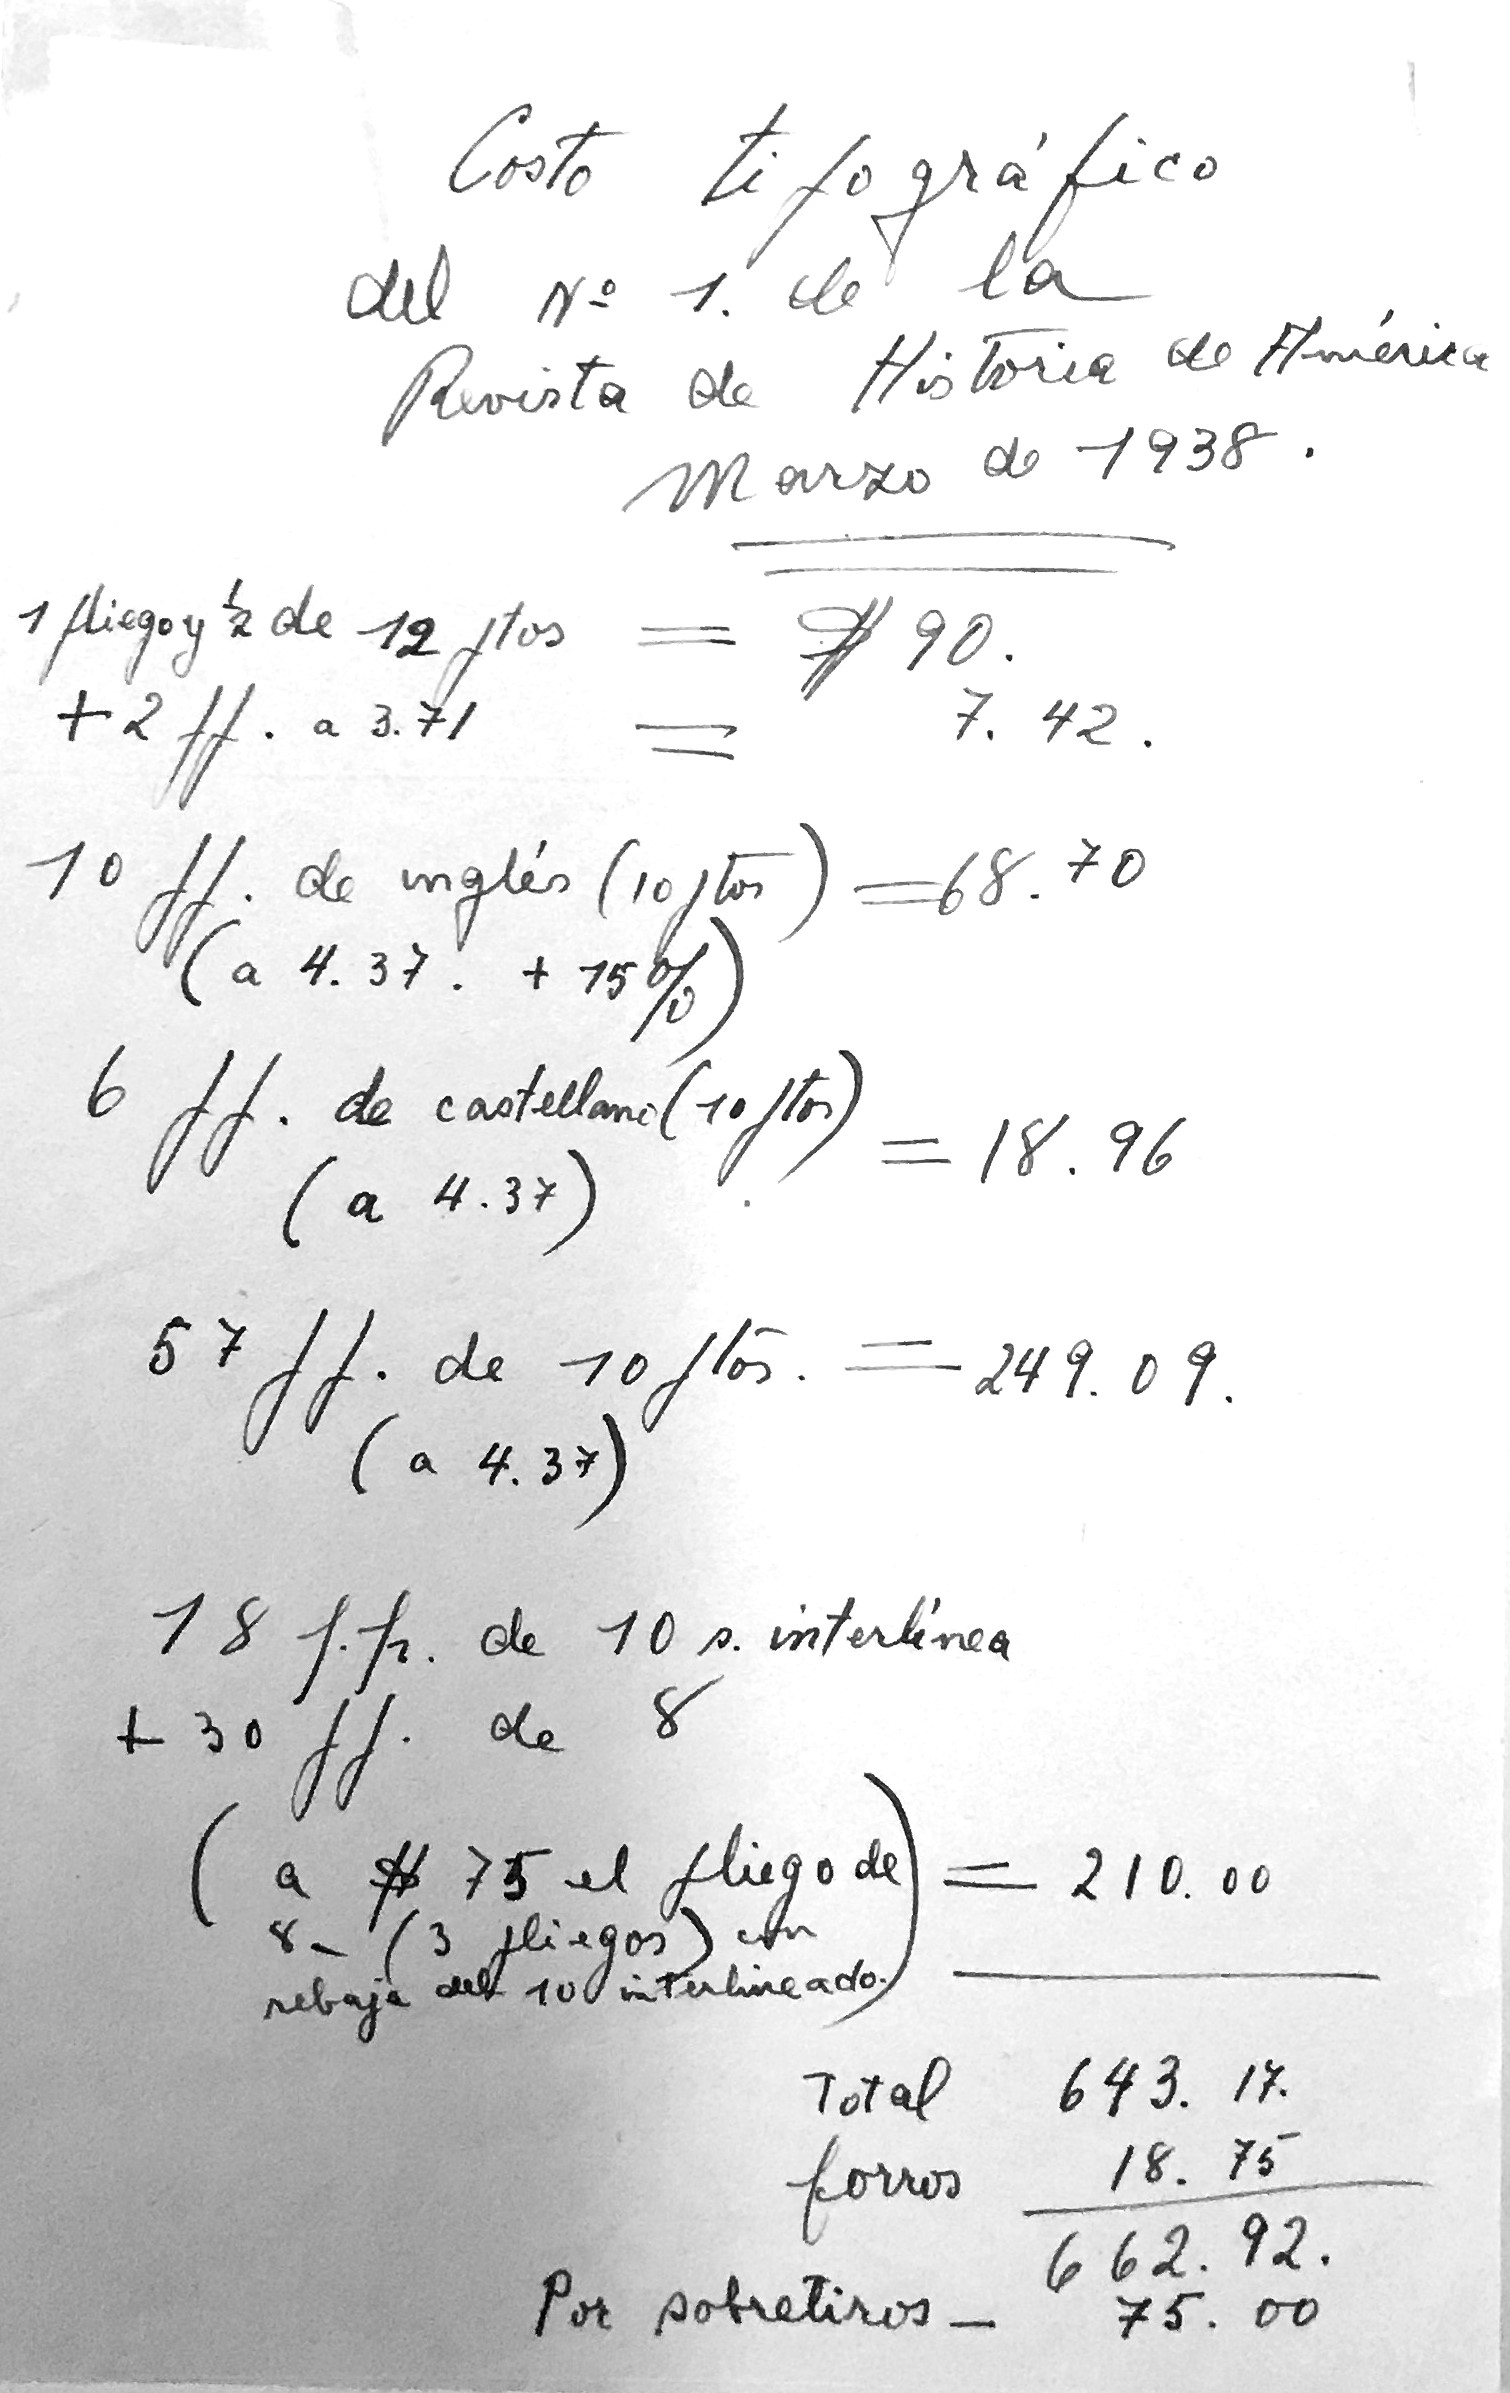 p. 52